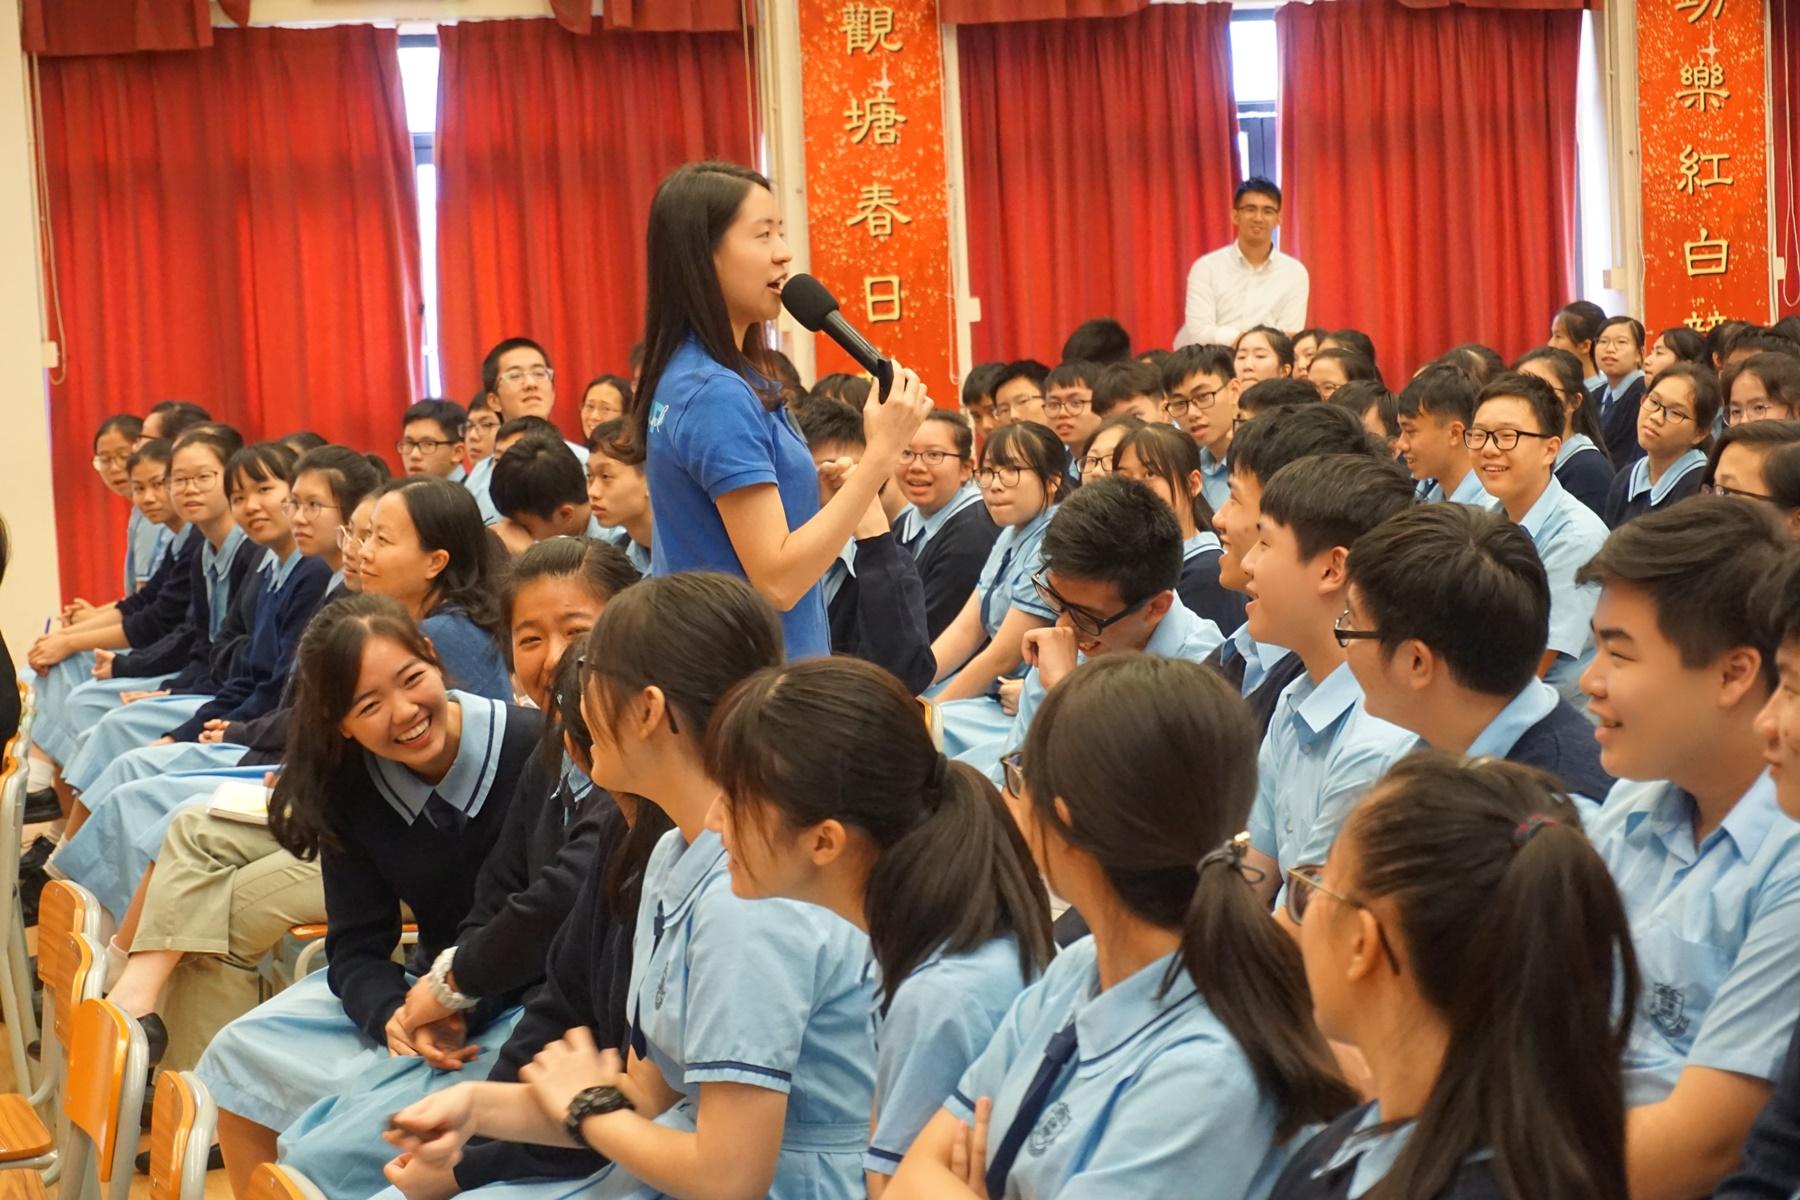 http://npc.edu.hk/sites/default/files/dsc04056.jpg